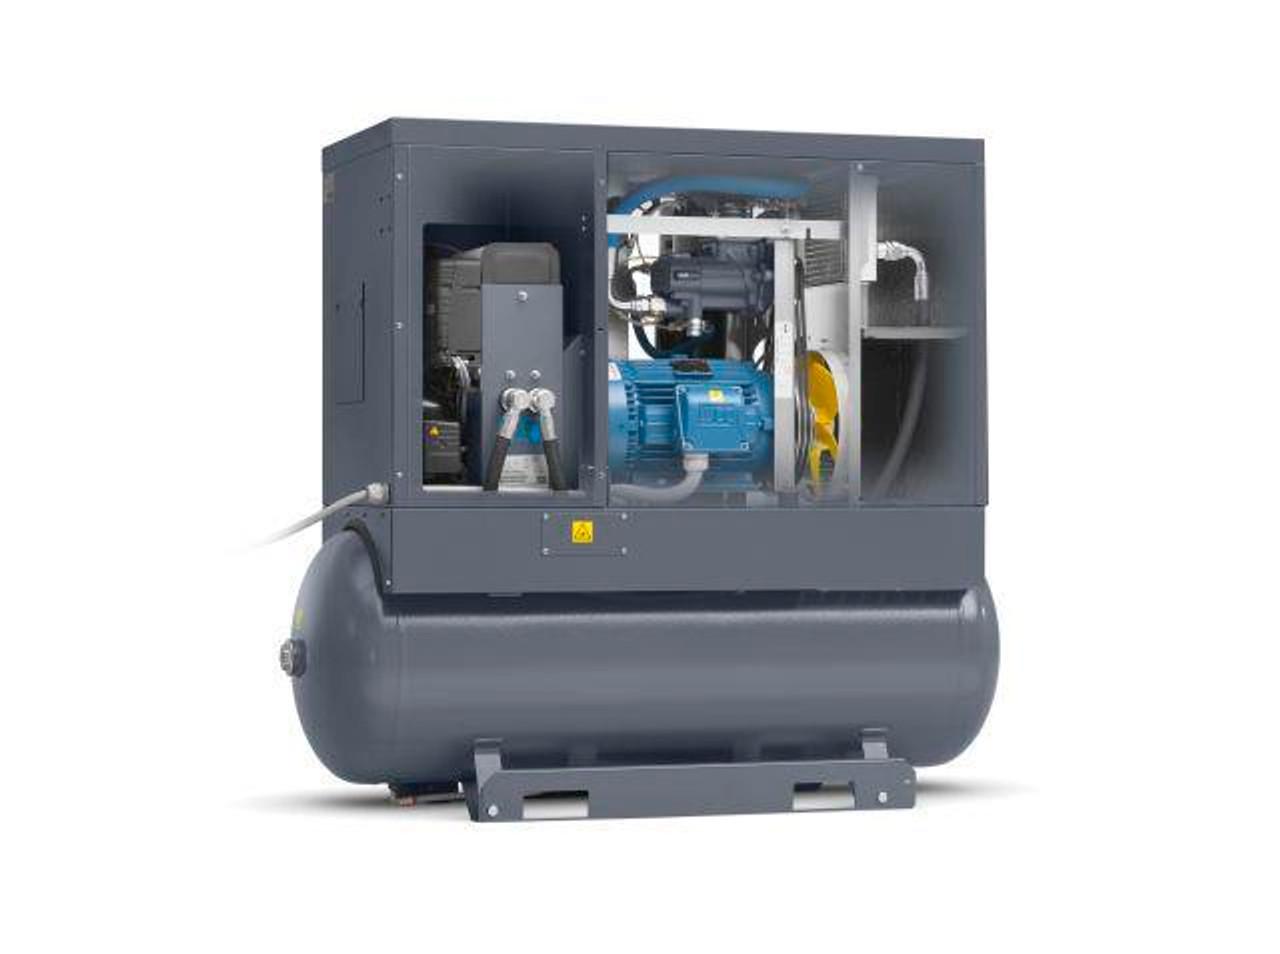 Atlas Copco Screw Compressor - G4 - 6HP 17CFM